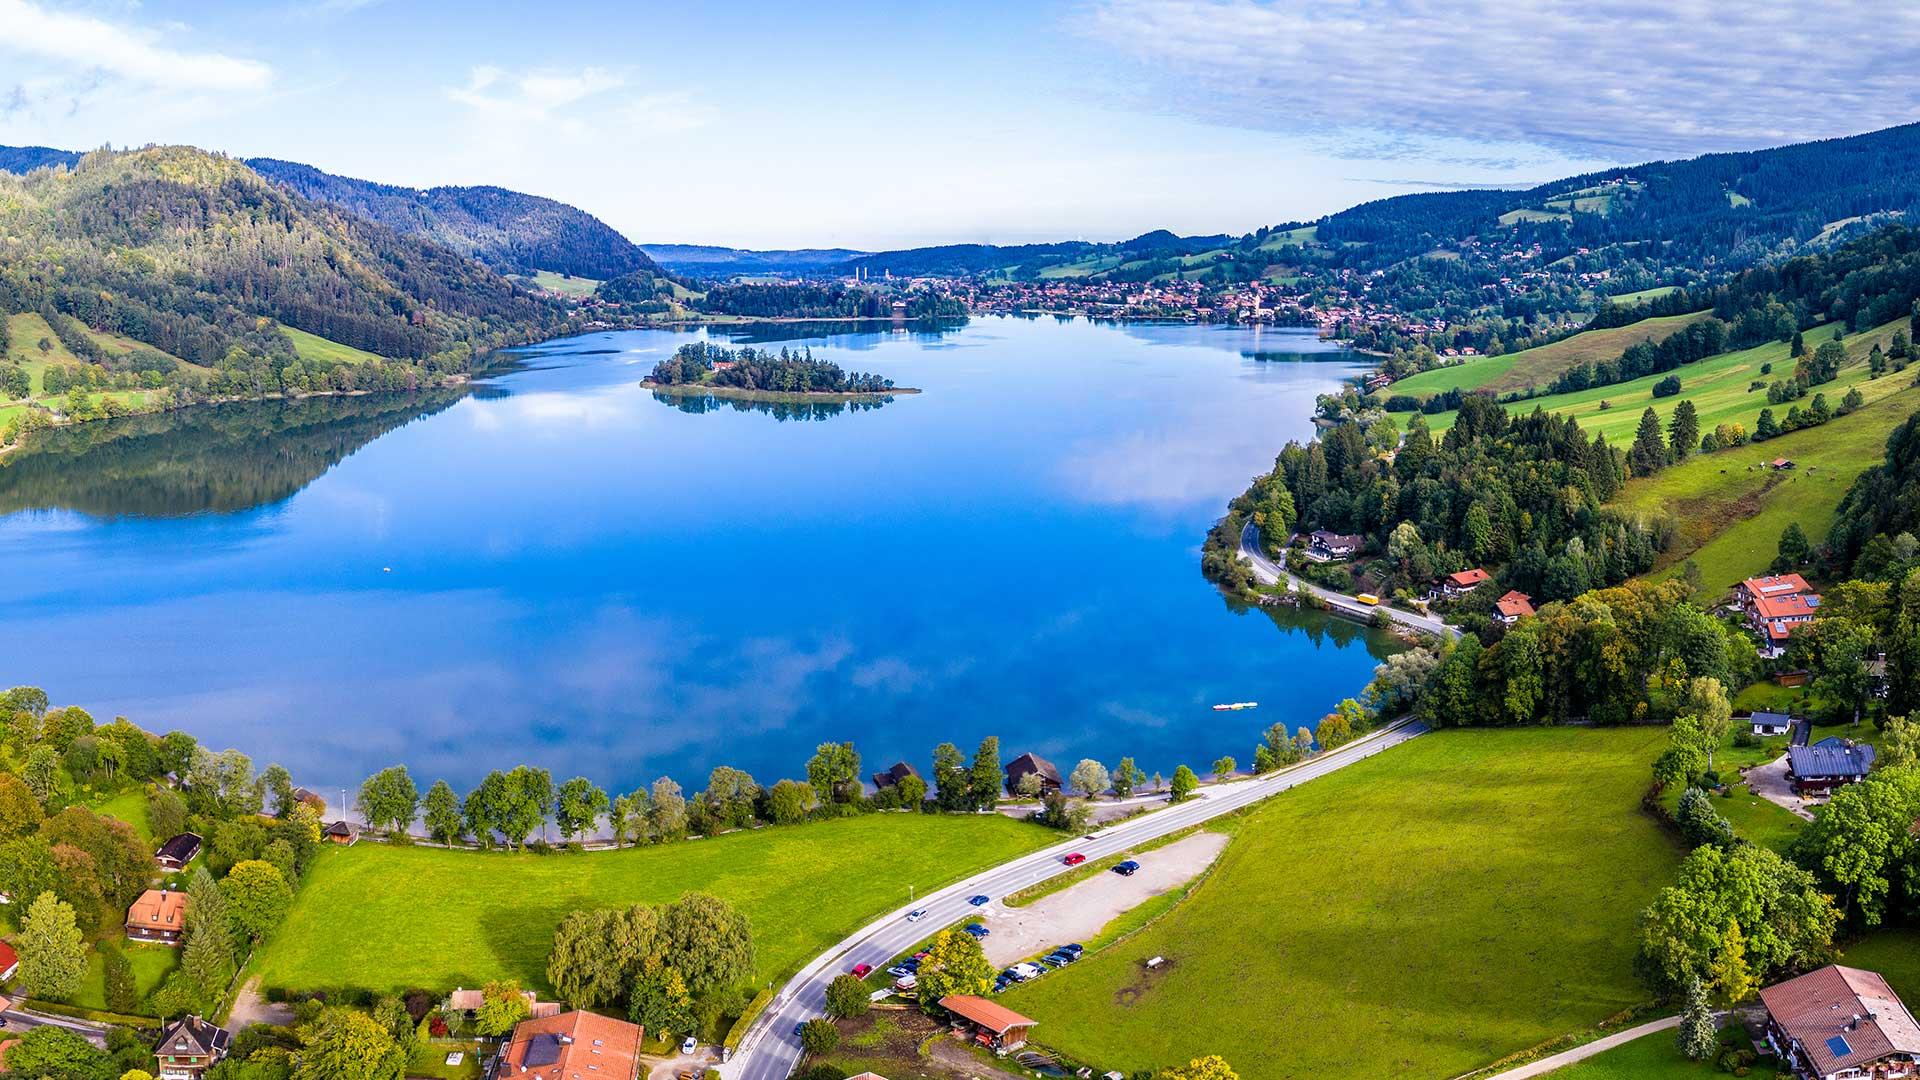 5 Reasons Why You Should Visit Bavaria